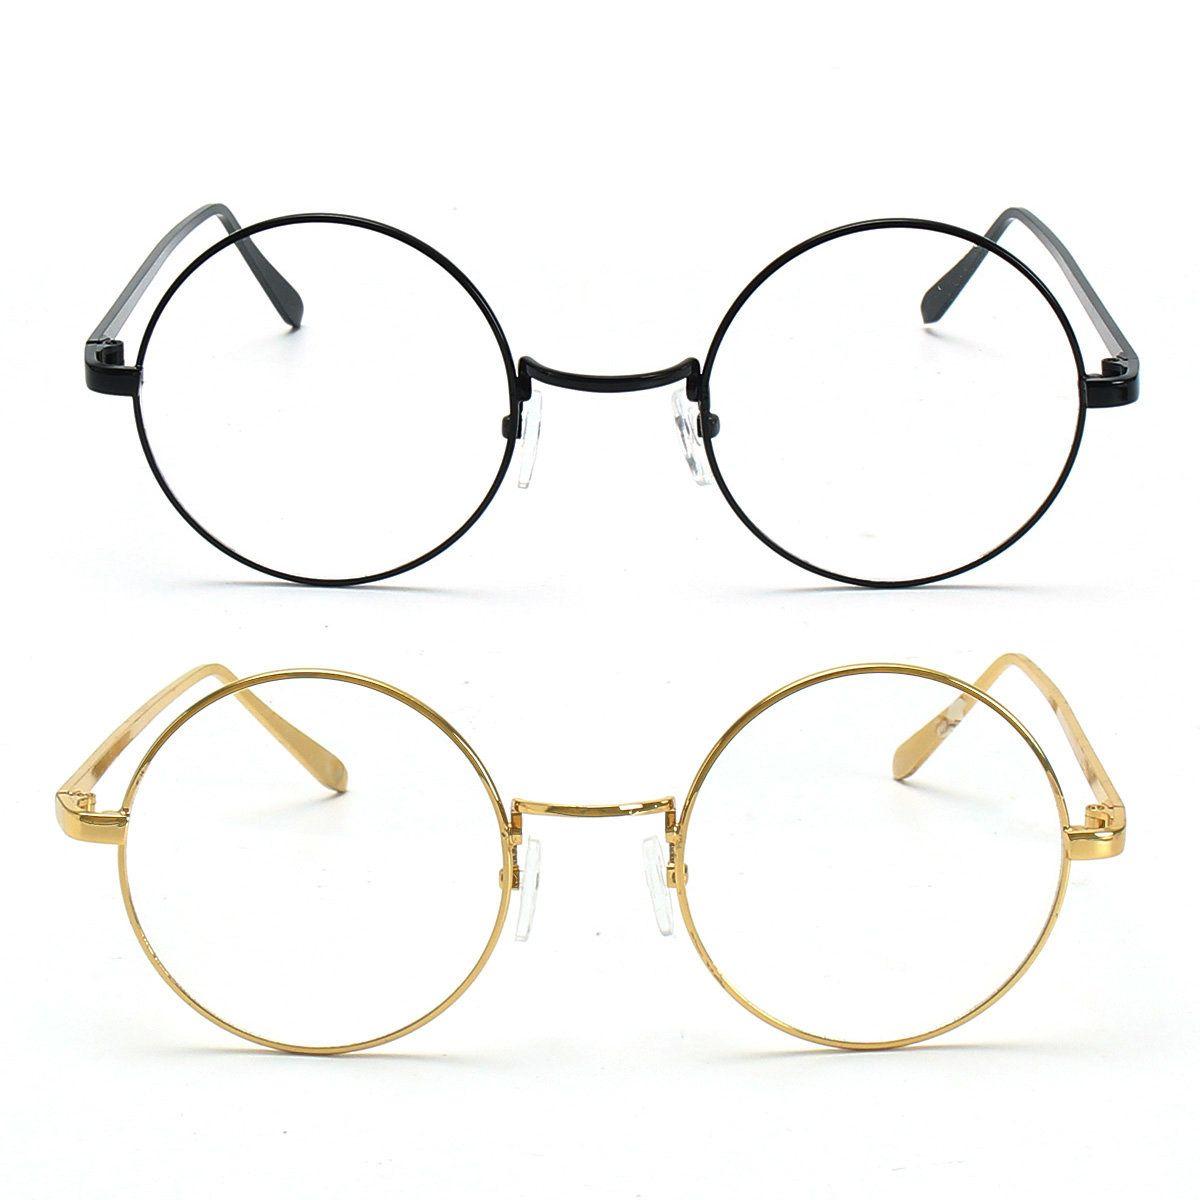 eb02580c80ef GOLD Metal Vintage Round Eyeglass Frame Clear Lens Full-Rim Glasses -  Banggood Mobile